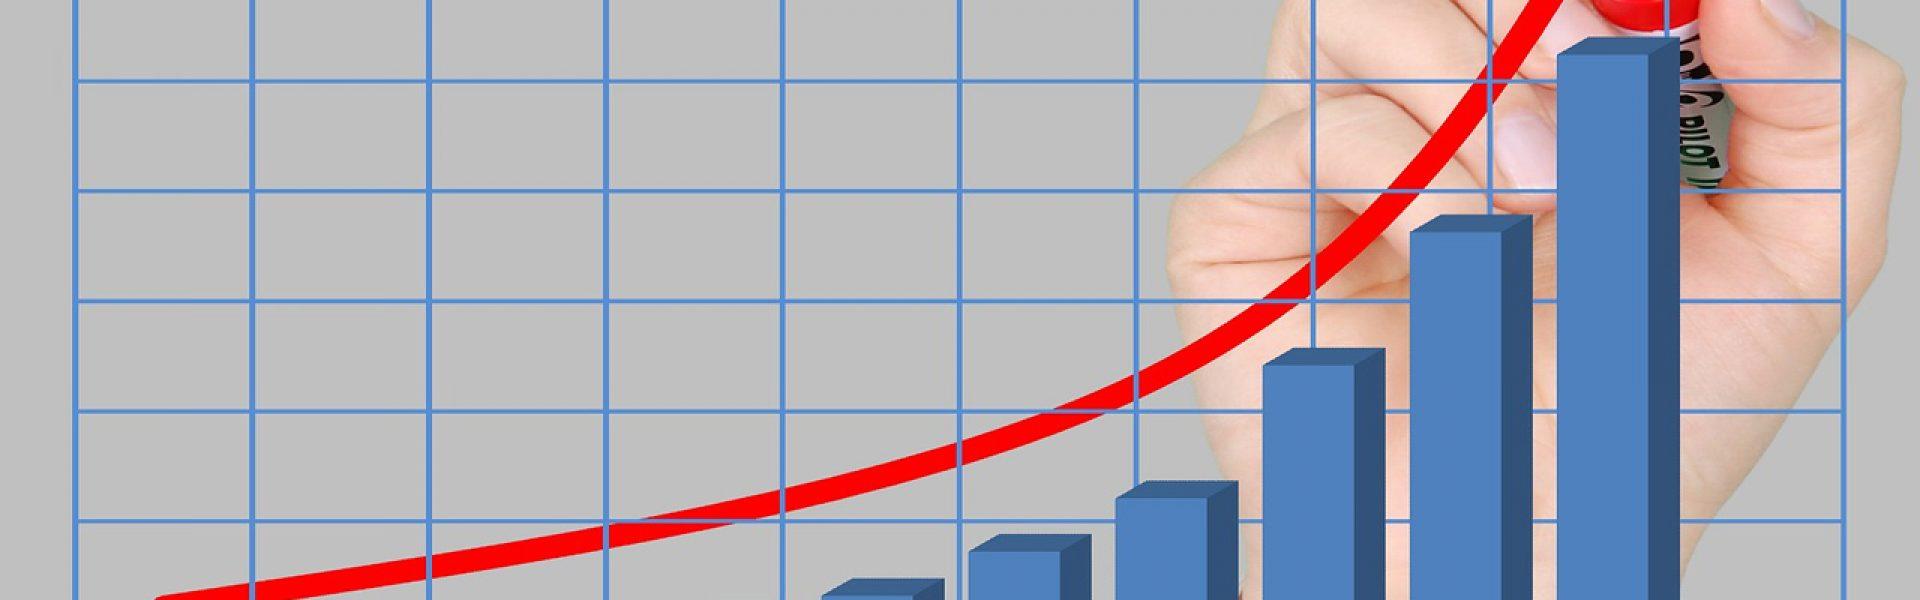 profits-1953616_1280